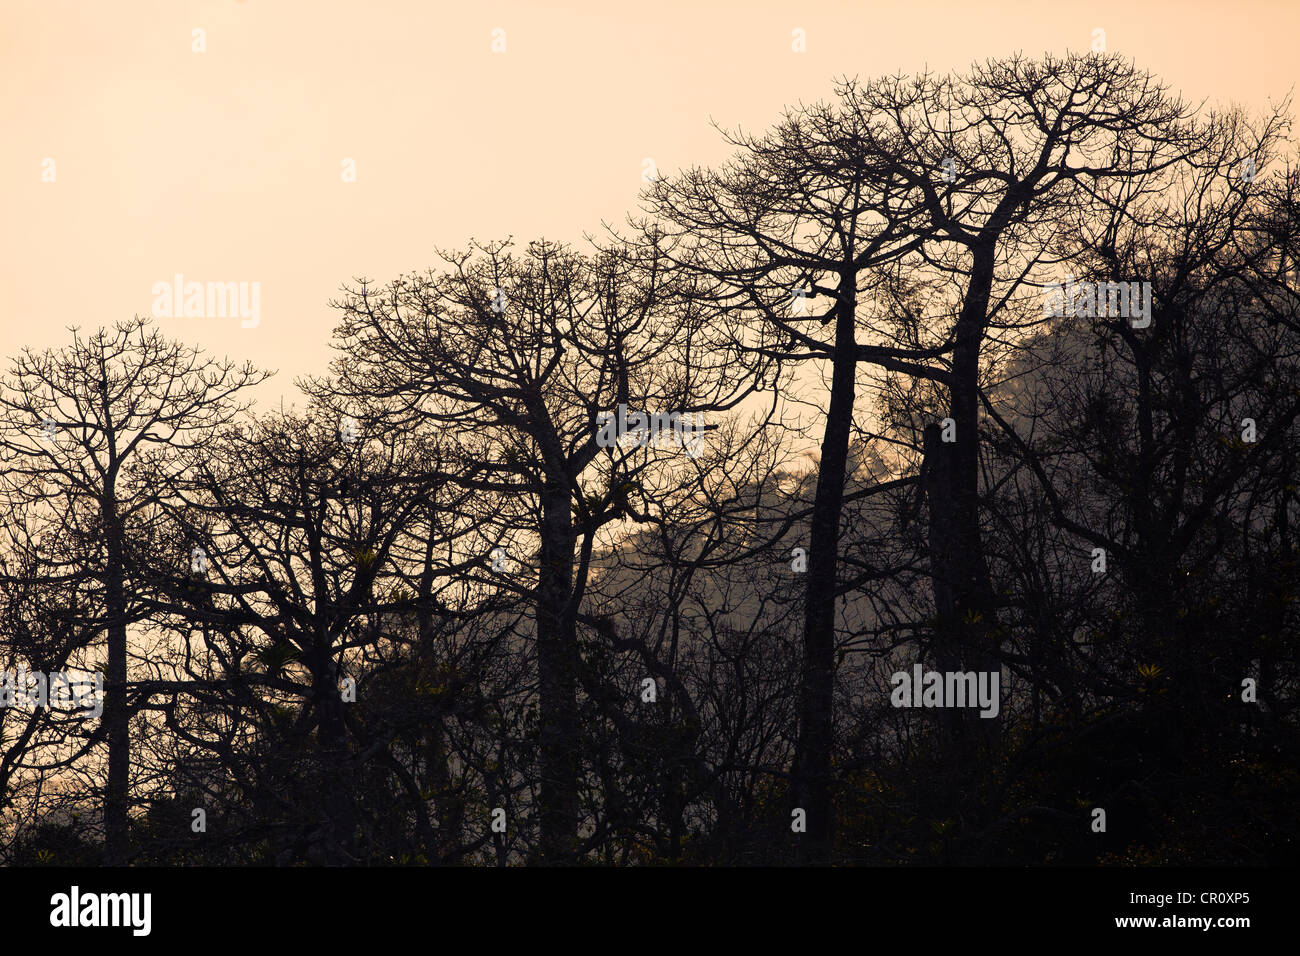 Large Cuipo trees in the dry season, in the rainforest beside Gatun lake, (Lago Gatun), Republic of Panama. - Stock Image